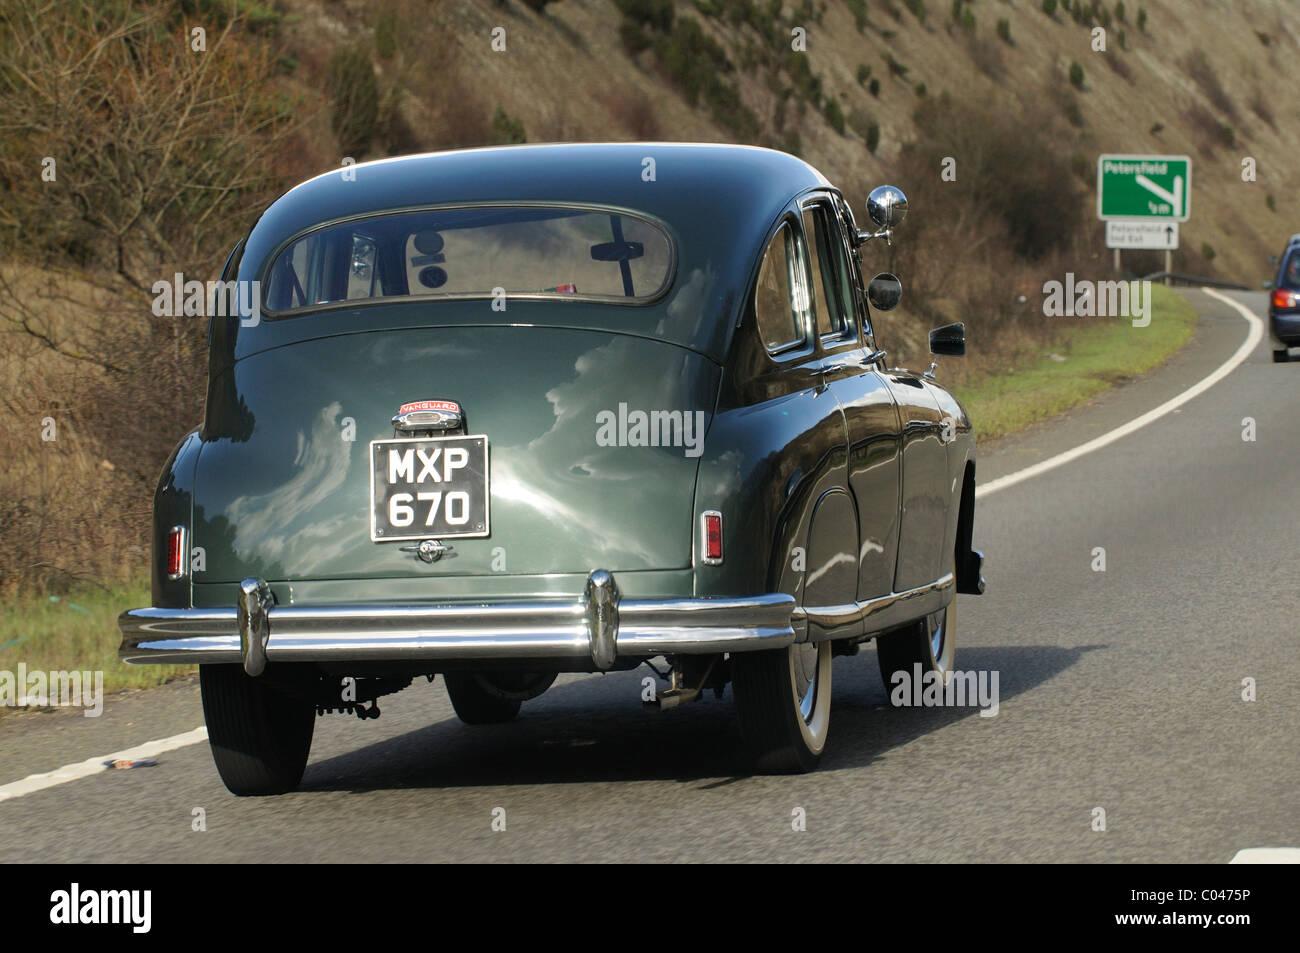 Vintage Vauxhall Motor Car Stock Photos & Vintage Vauxhall Motor Car ...